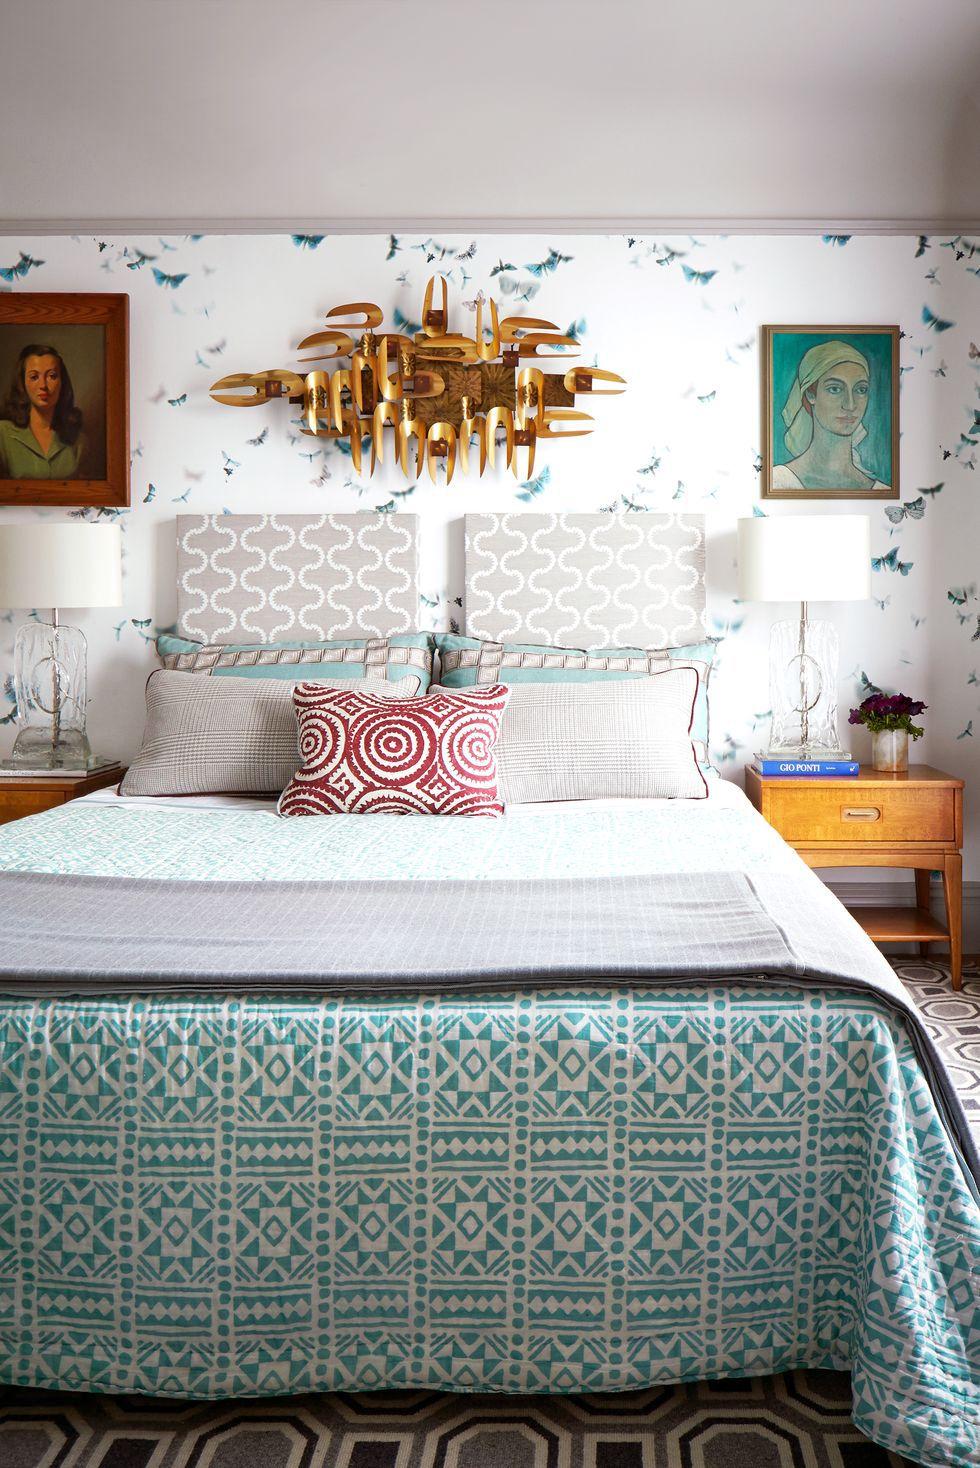 19 Best Bedroom Wall Decor Ideas In 2020 Bedroom Wall Decor Inspiration